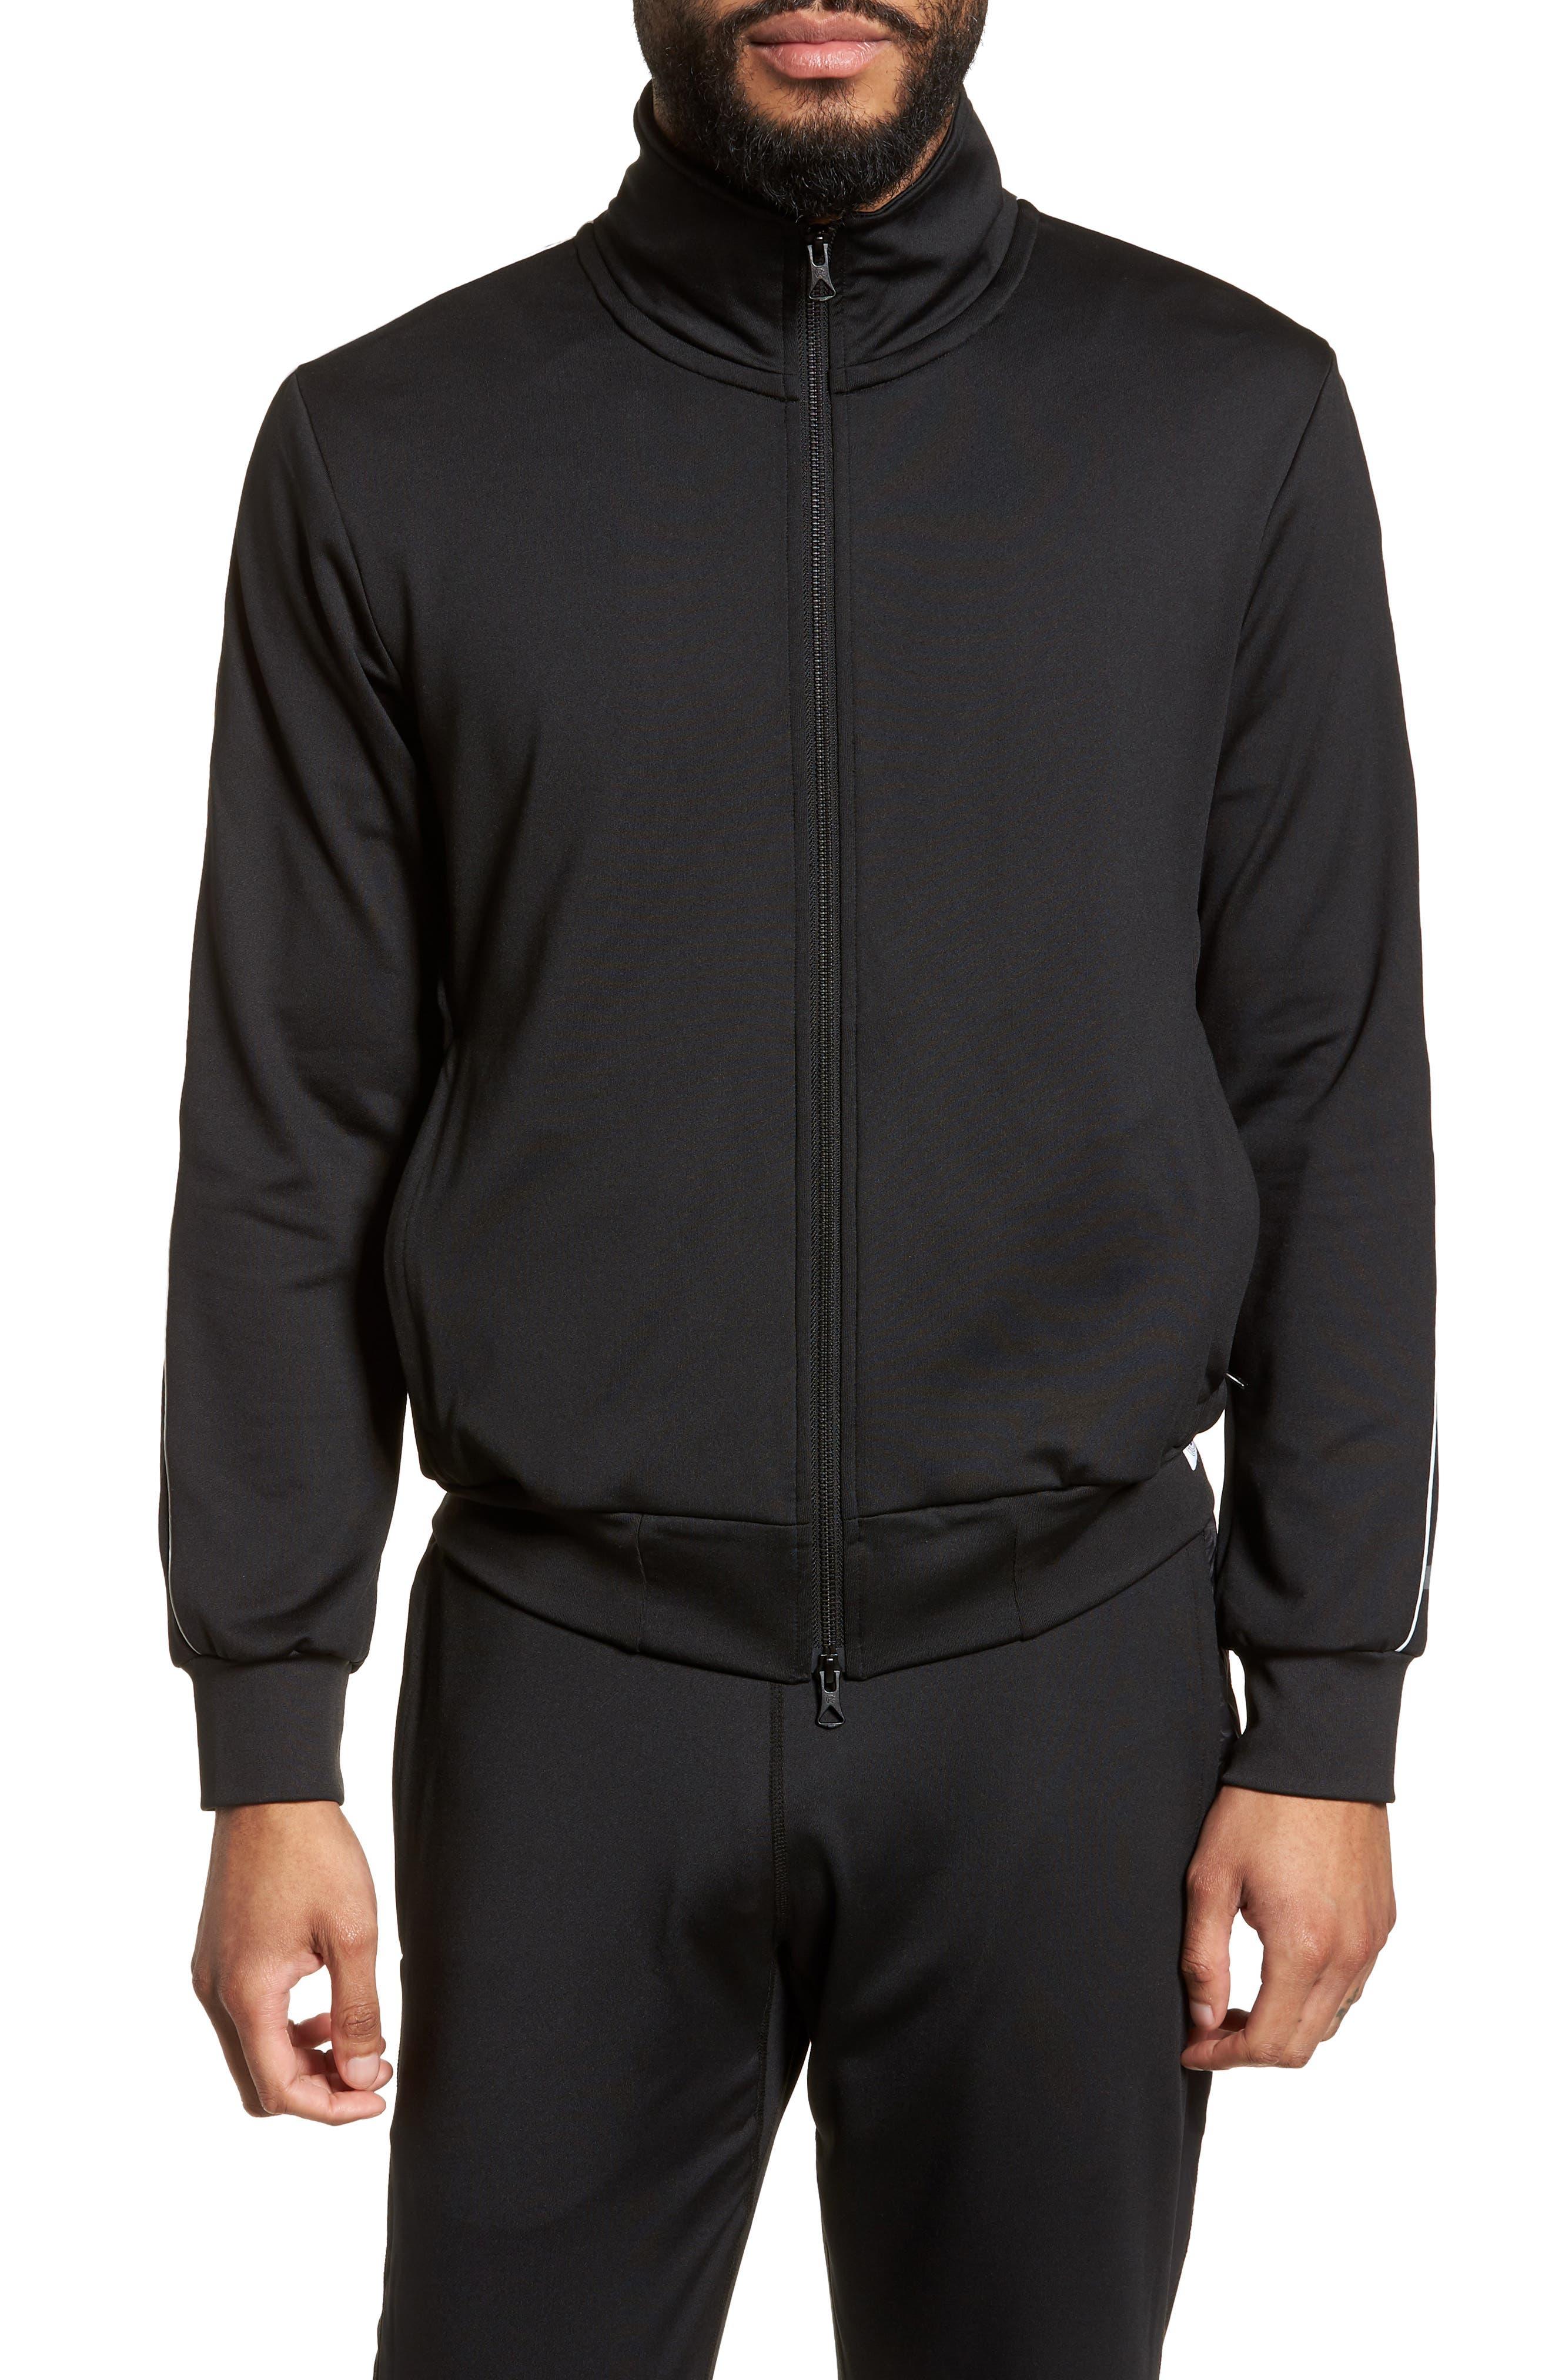 CoolMax<sup>®</sup> Track Jacket,                             Main thumbnail 1, color,                             001